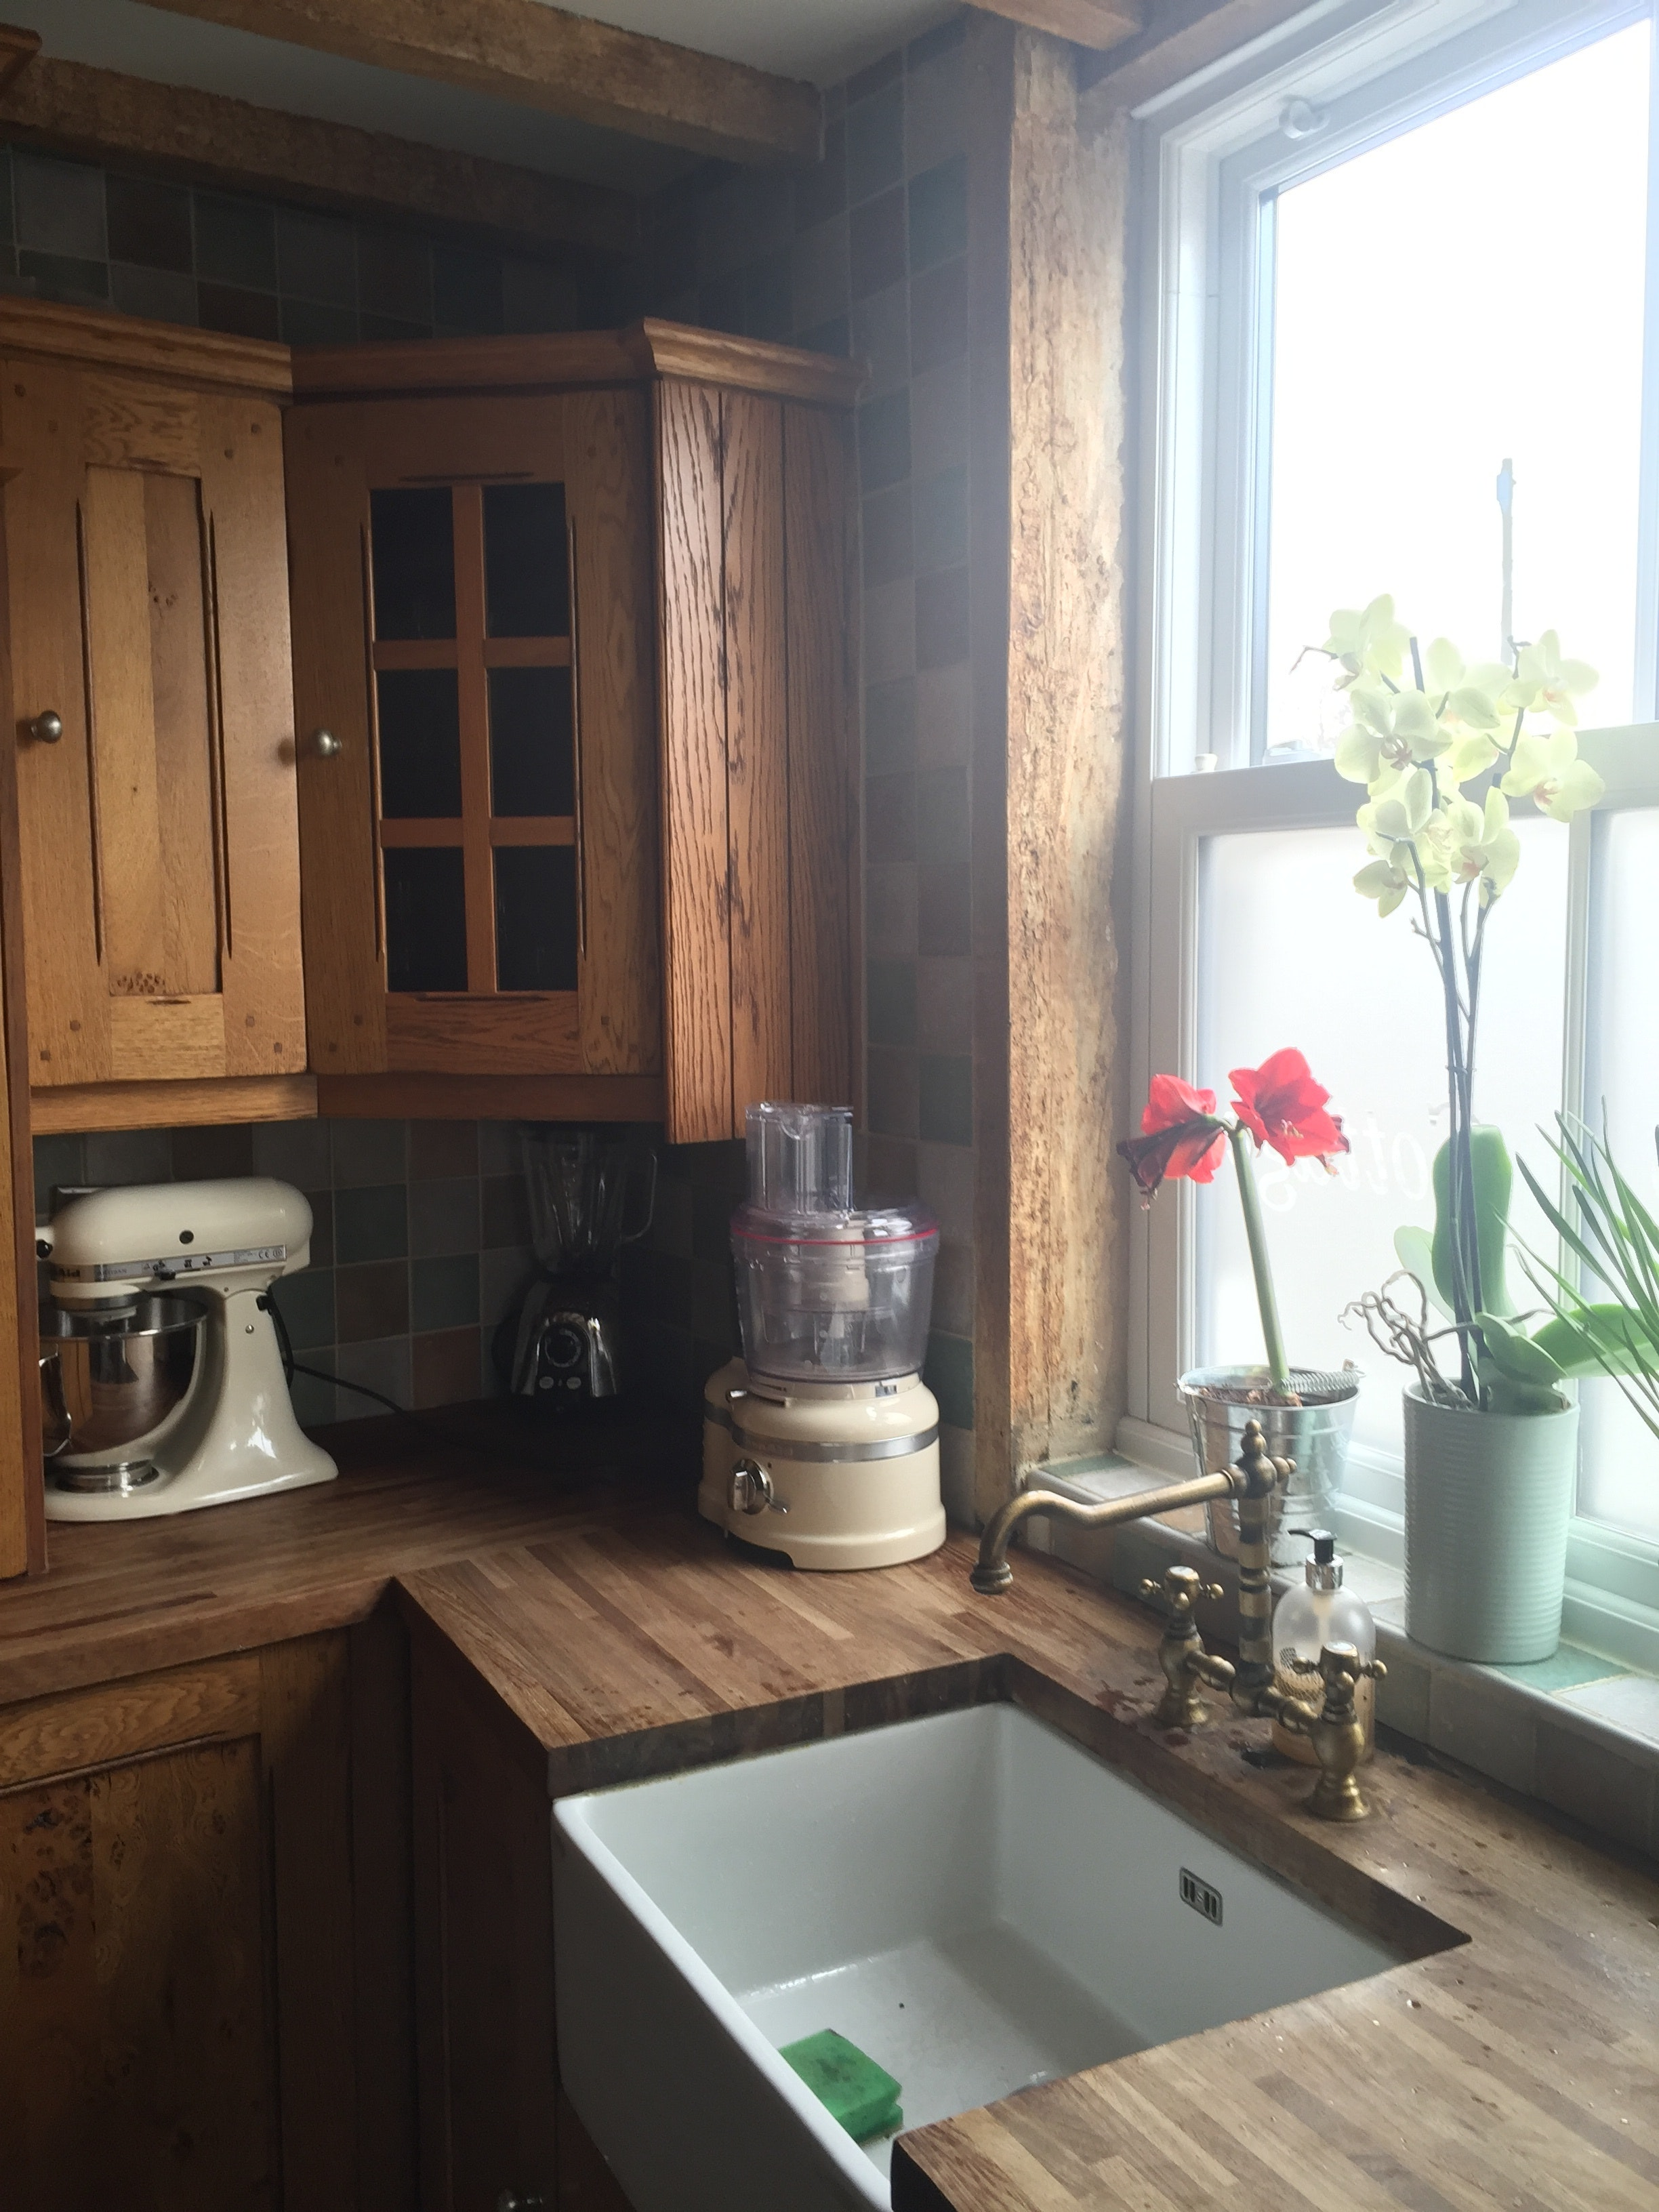 Free stock photo of Kitchen window cottage rustic window